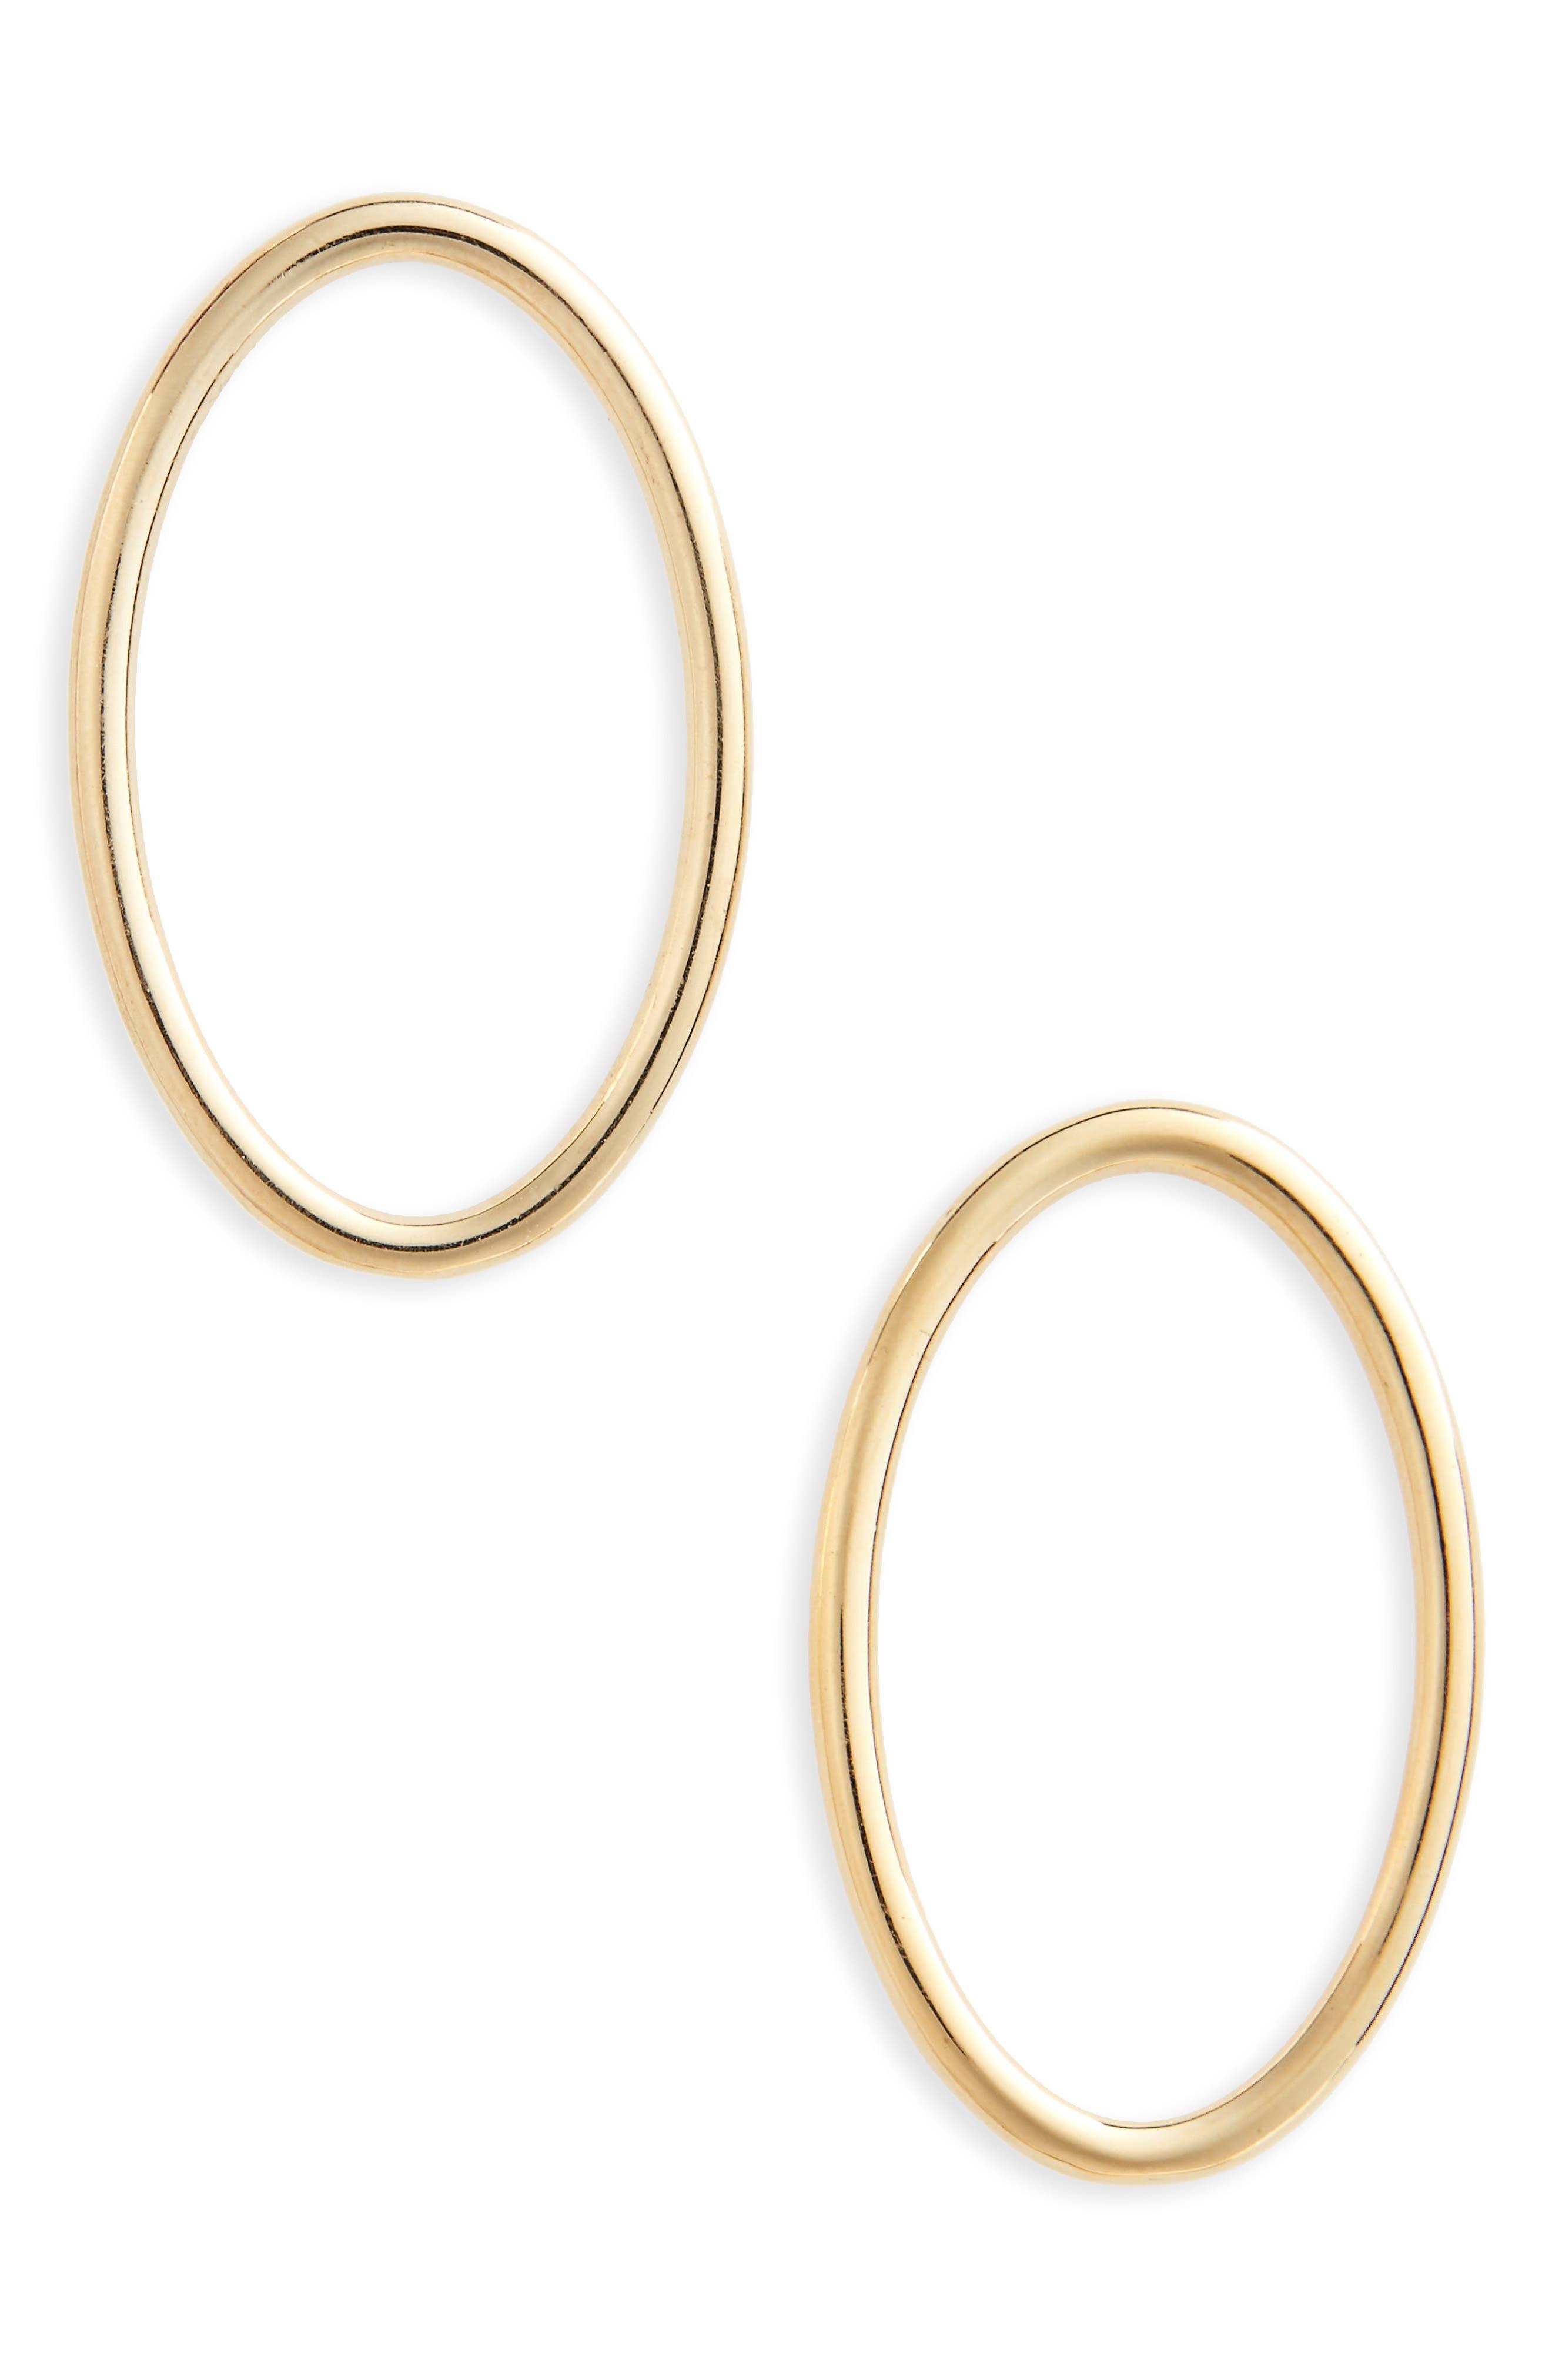 Large Ellipse Polished Vermeil Earrings,                         Main,                         color, POLISHED VERMEIL